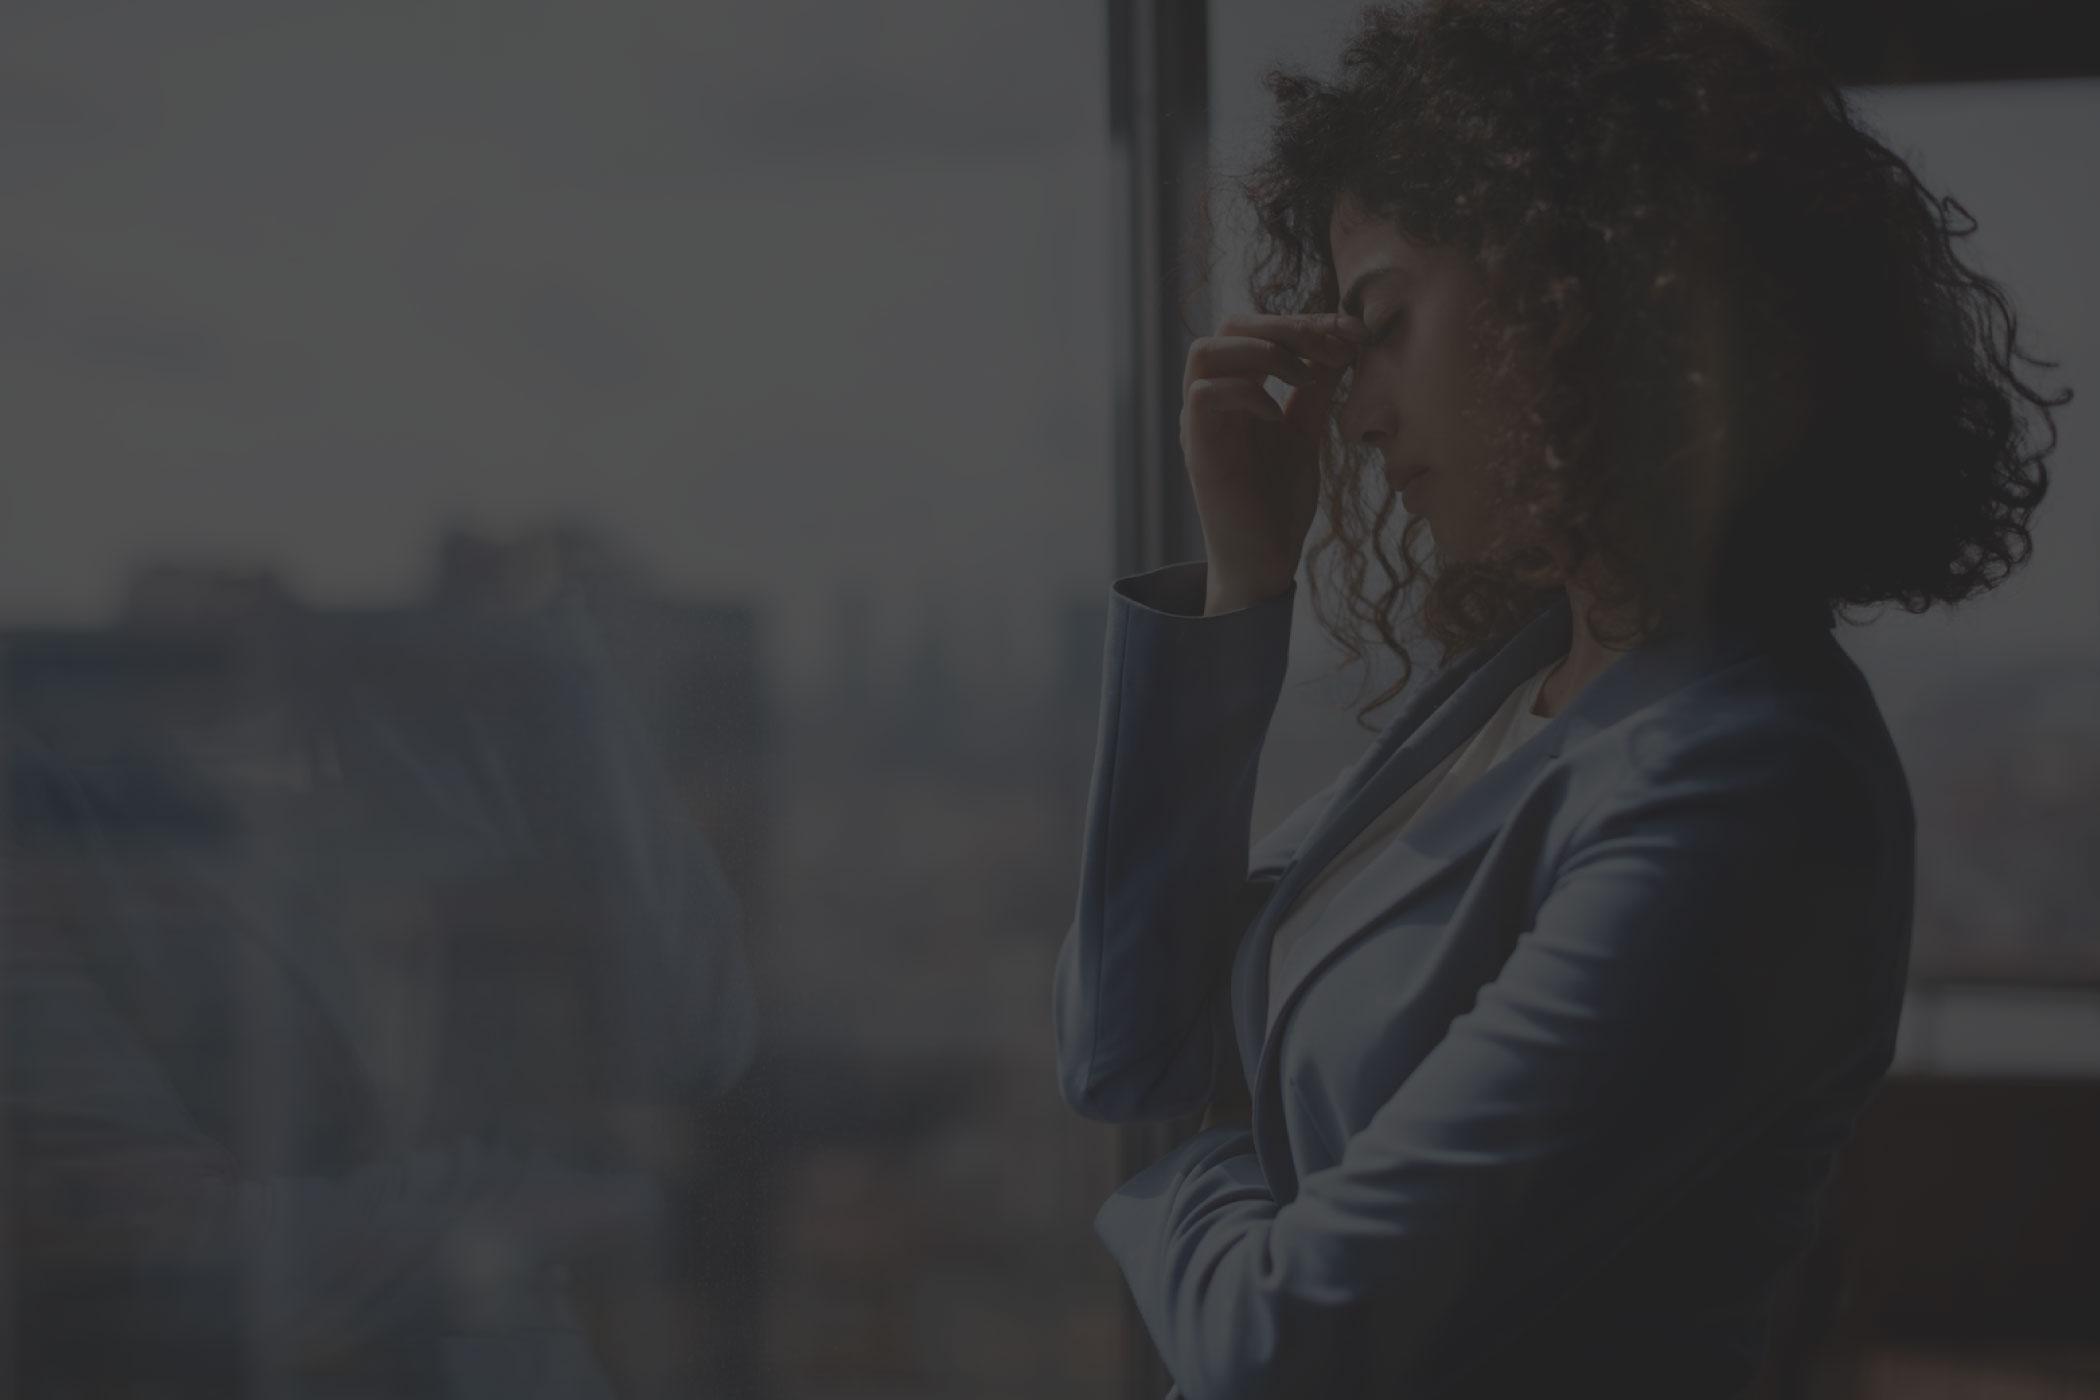 Woman with an anxiety-induced headache